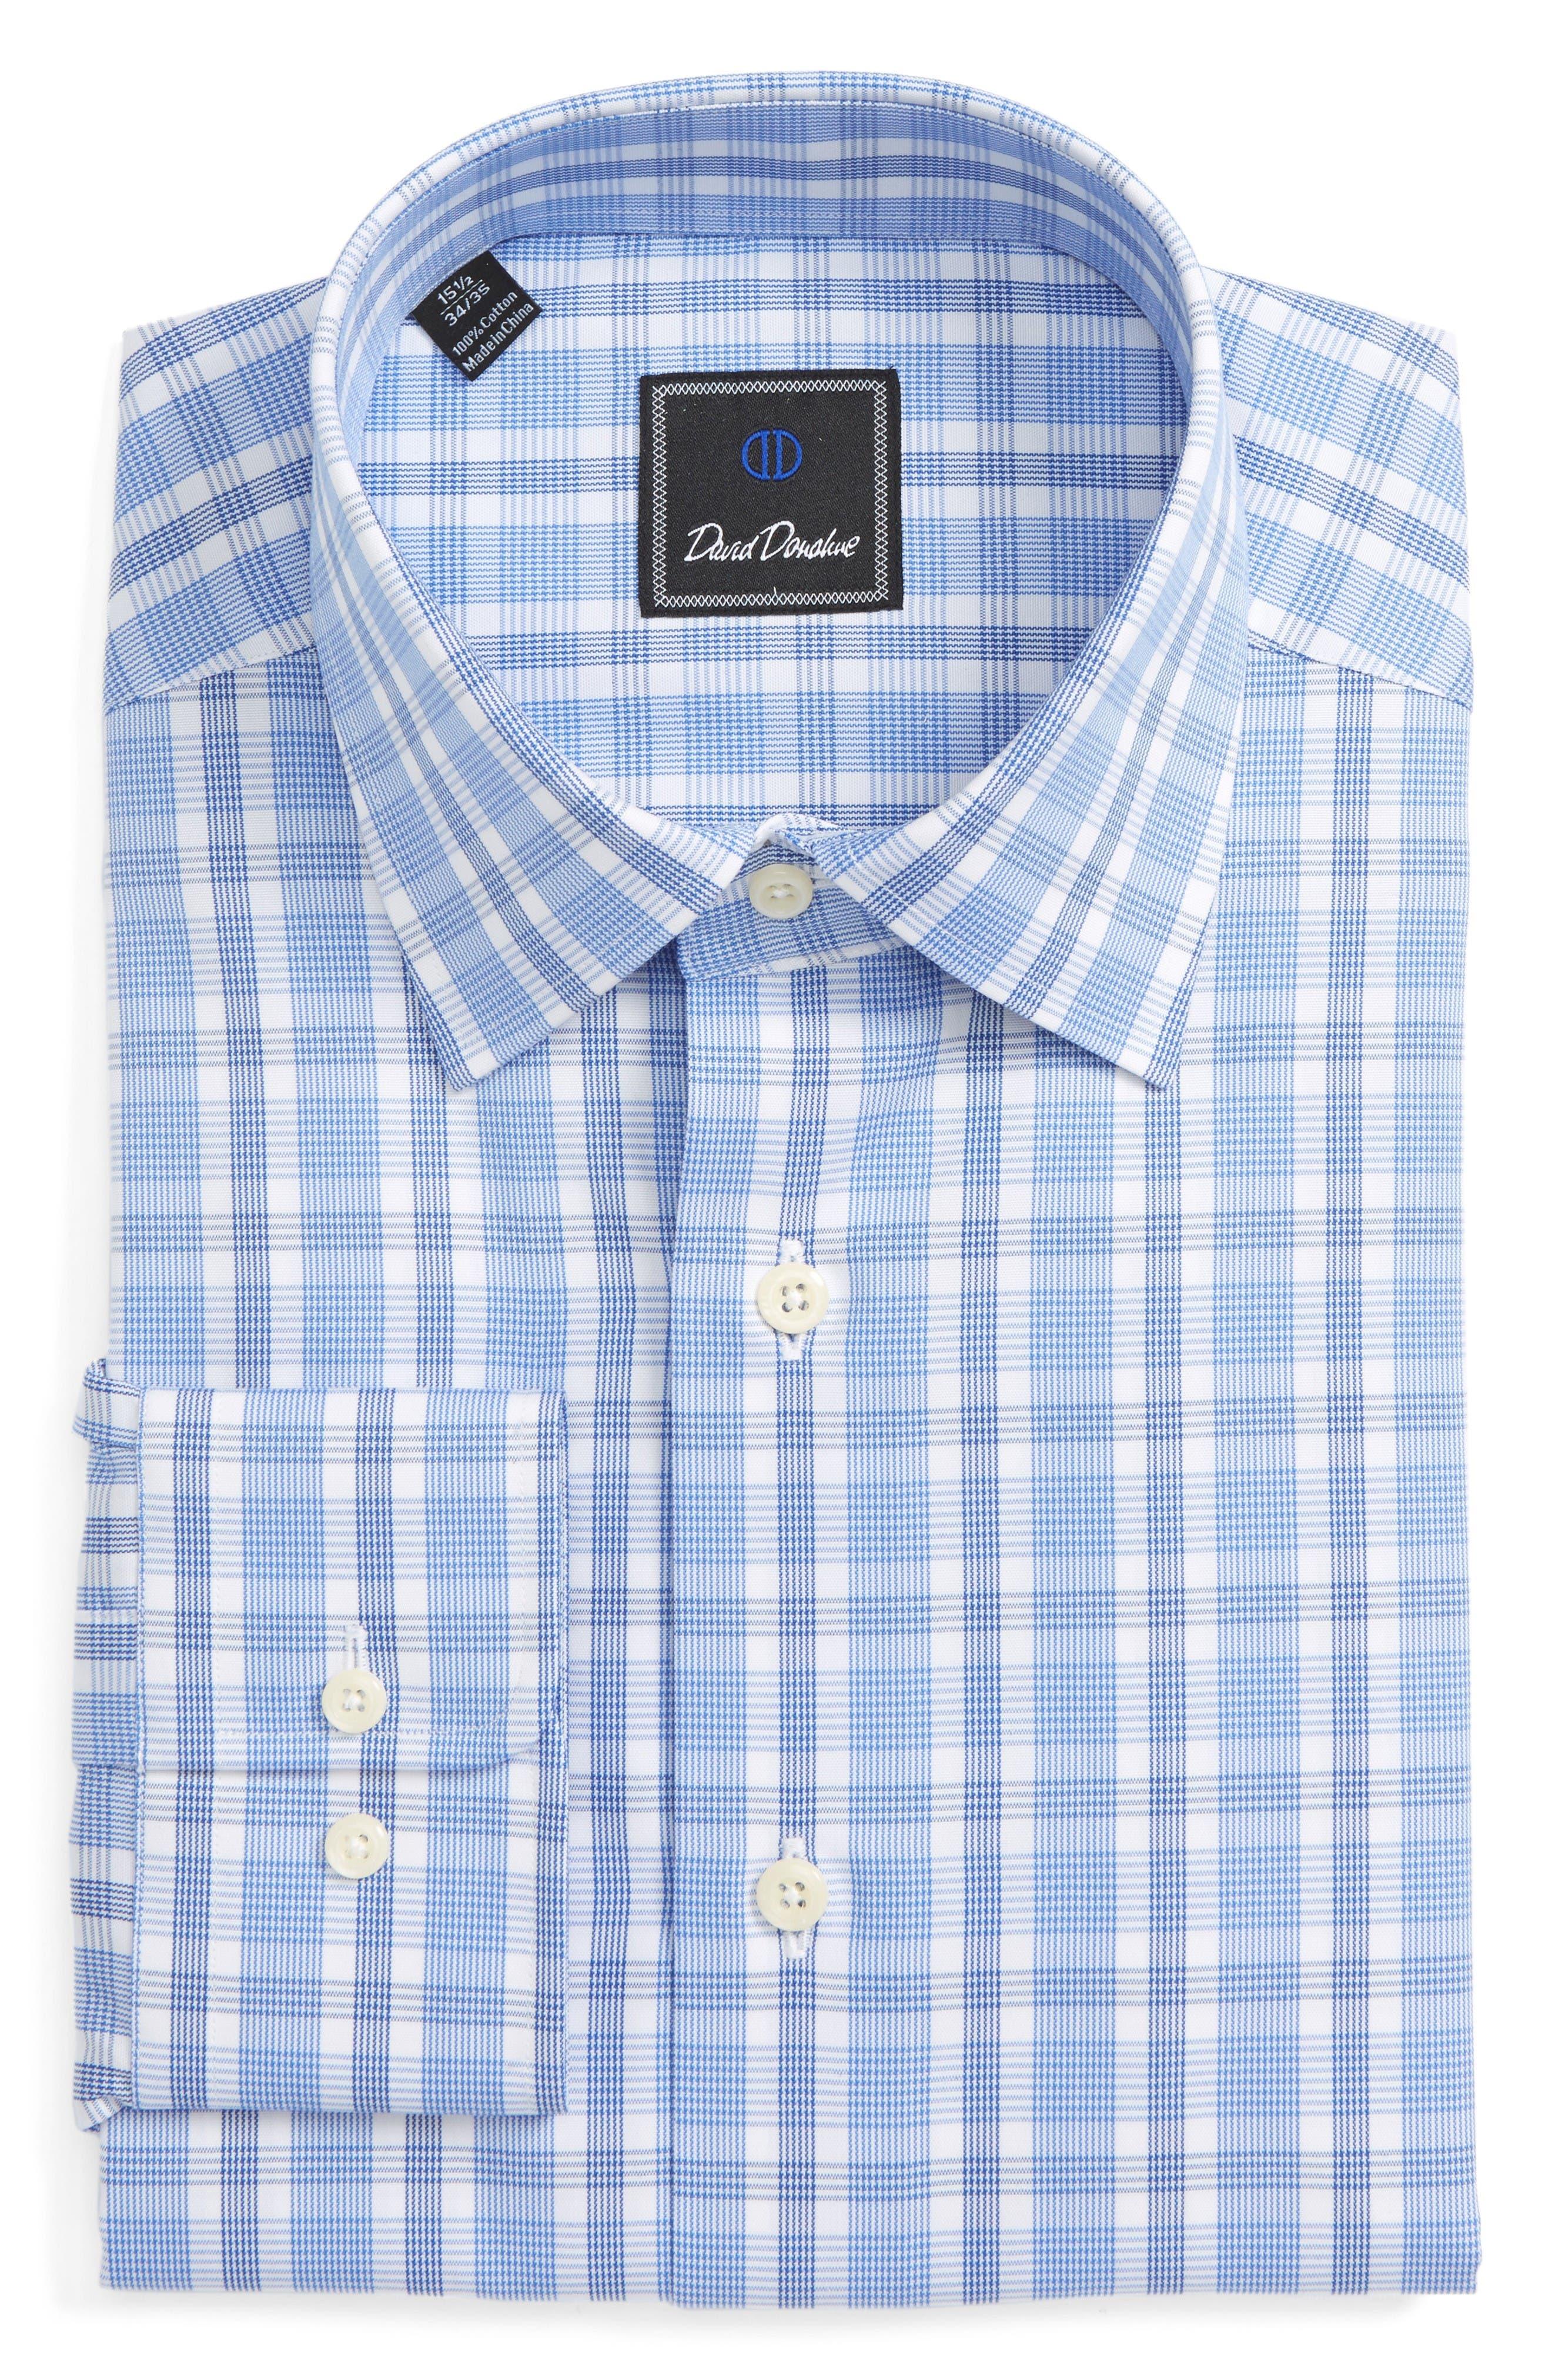 Regular Fit Check Dress Shirt,                         Main,                         color, Blue/ Navy